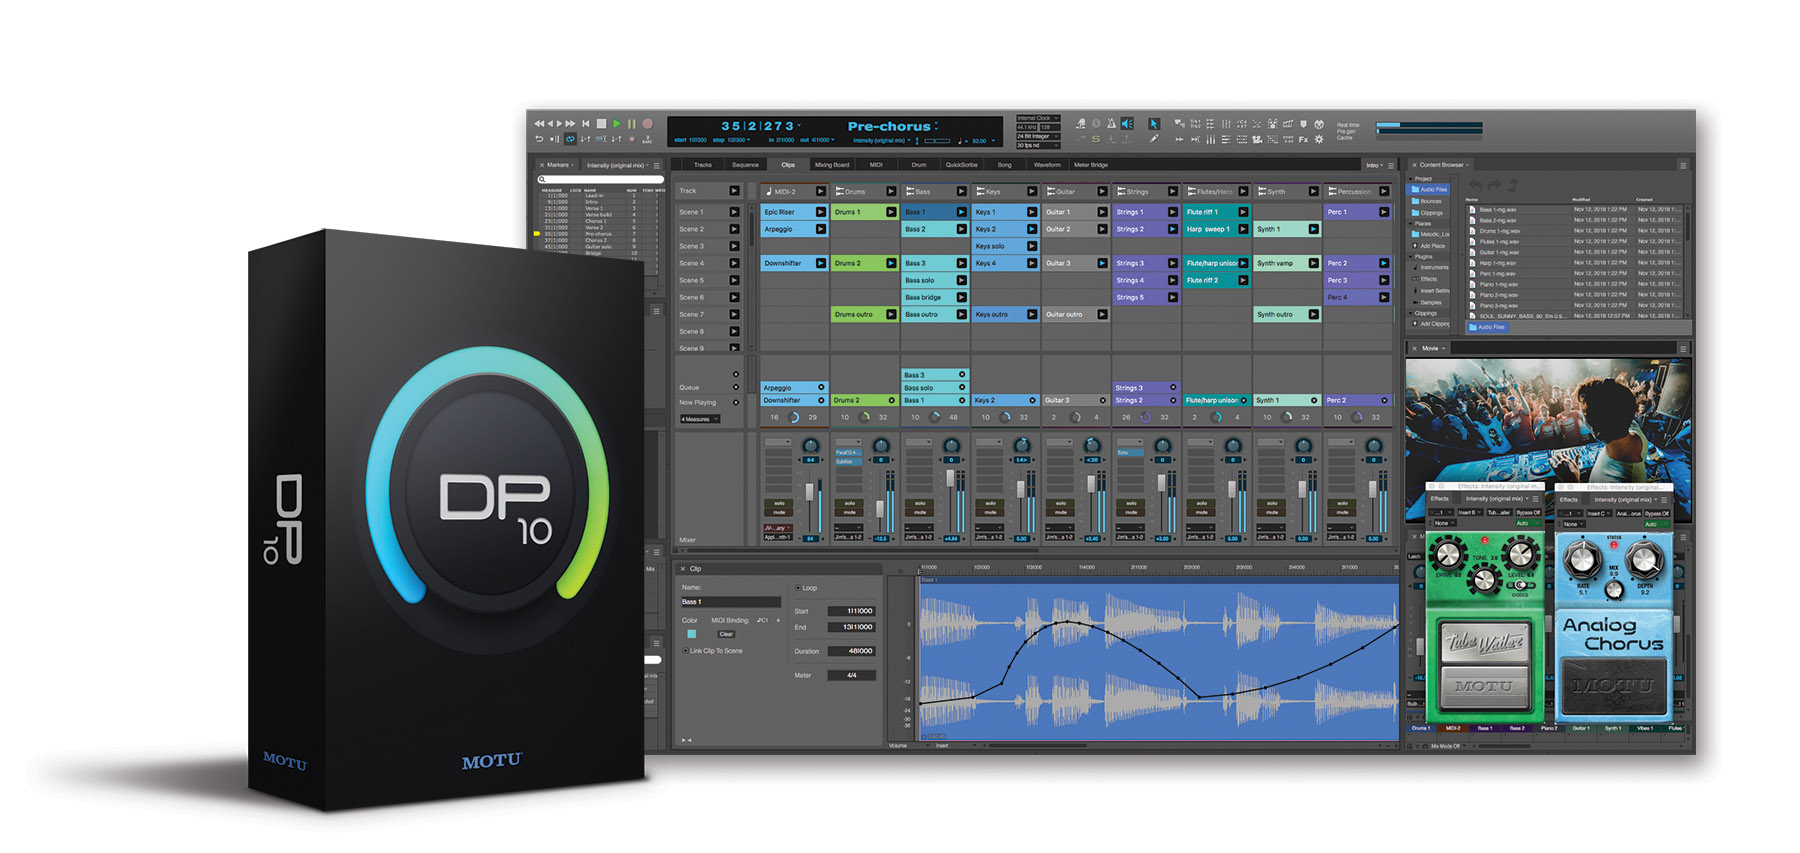 News: Motu zeigt Musikproduktionsumgebung Digital Performer 10